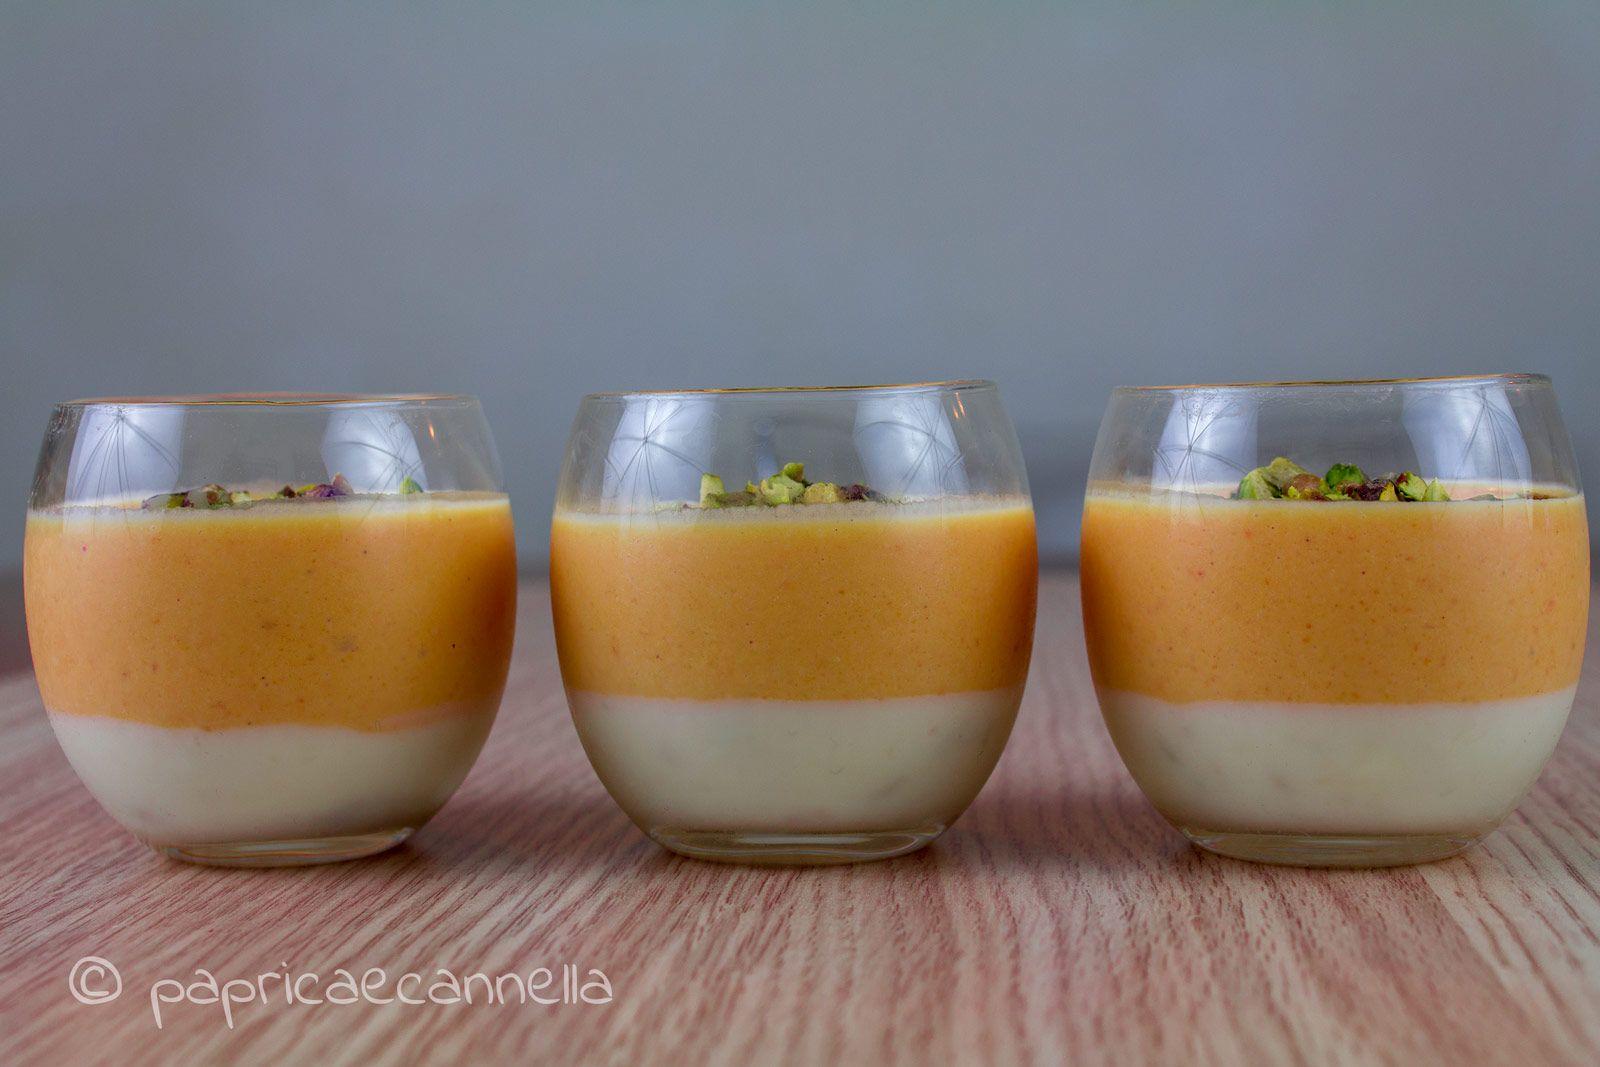 paprica e cannella BLOG: chot di crema di zucca e cuore di gorgonzola